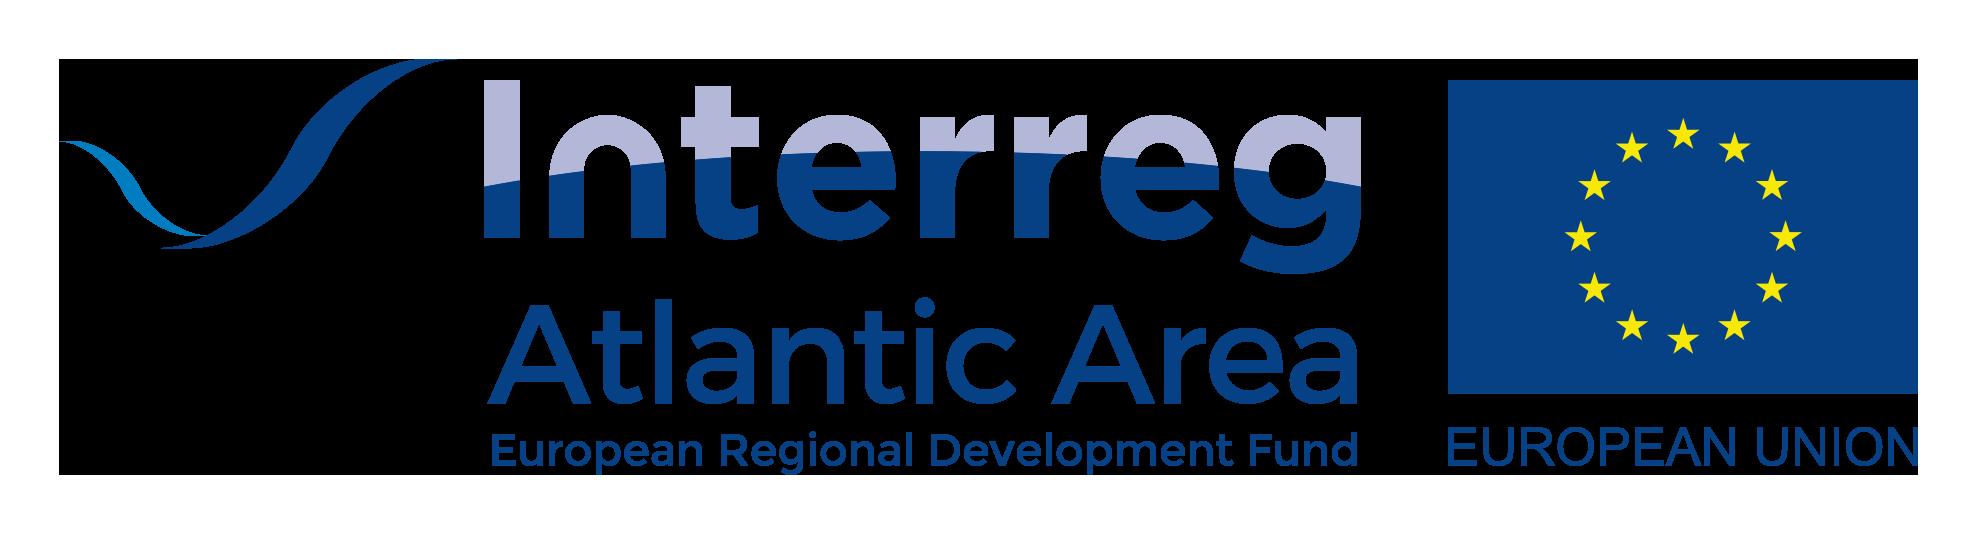 Logo_Interreg-Atlantic-Area_COLOR-FULL